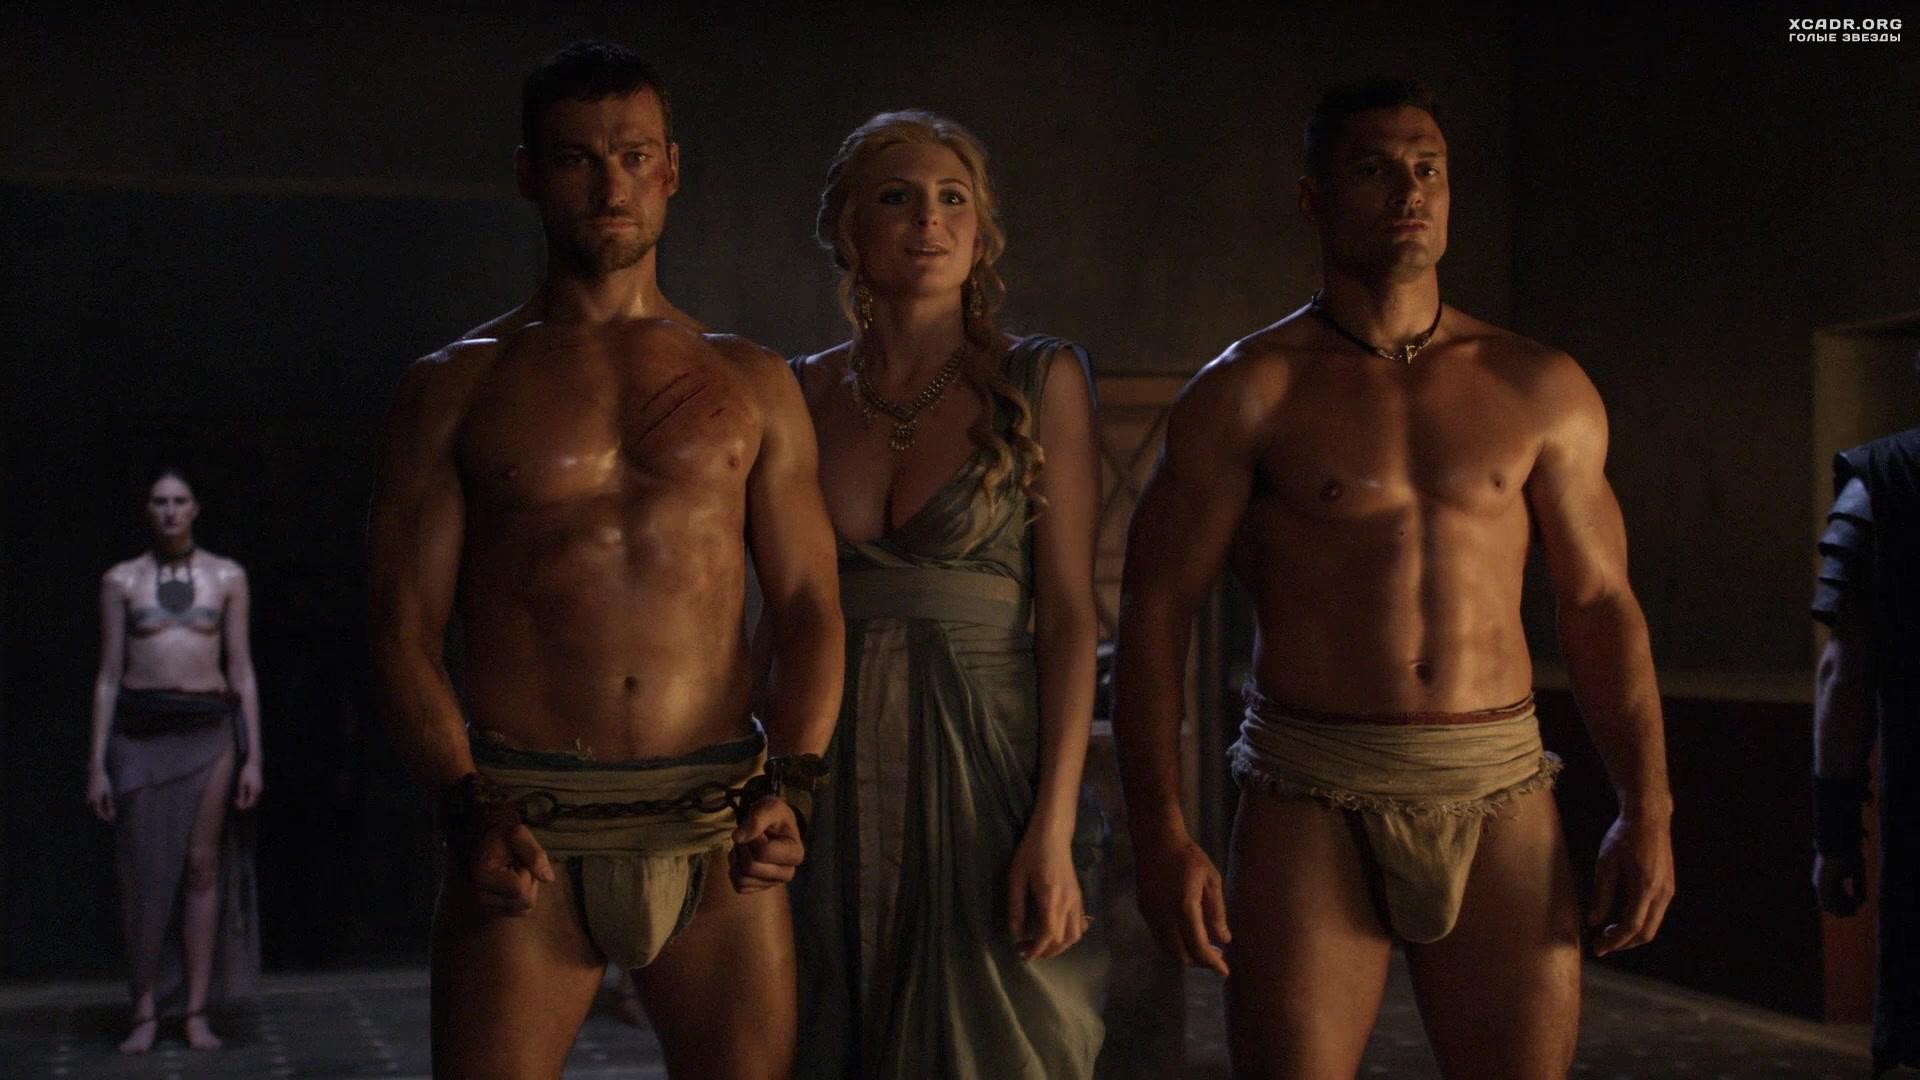 Spartacus sex scene lucy lawless crixus free pics